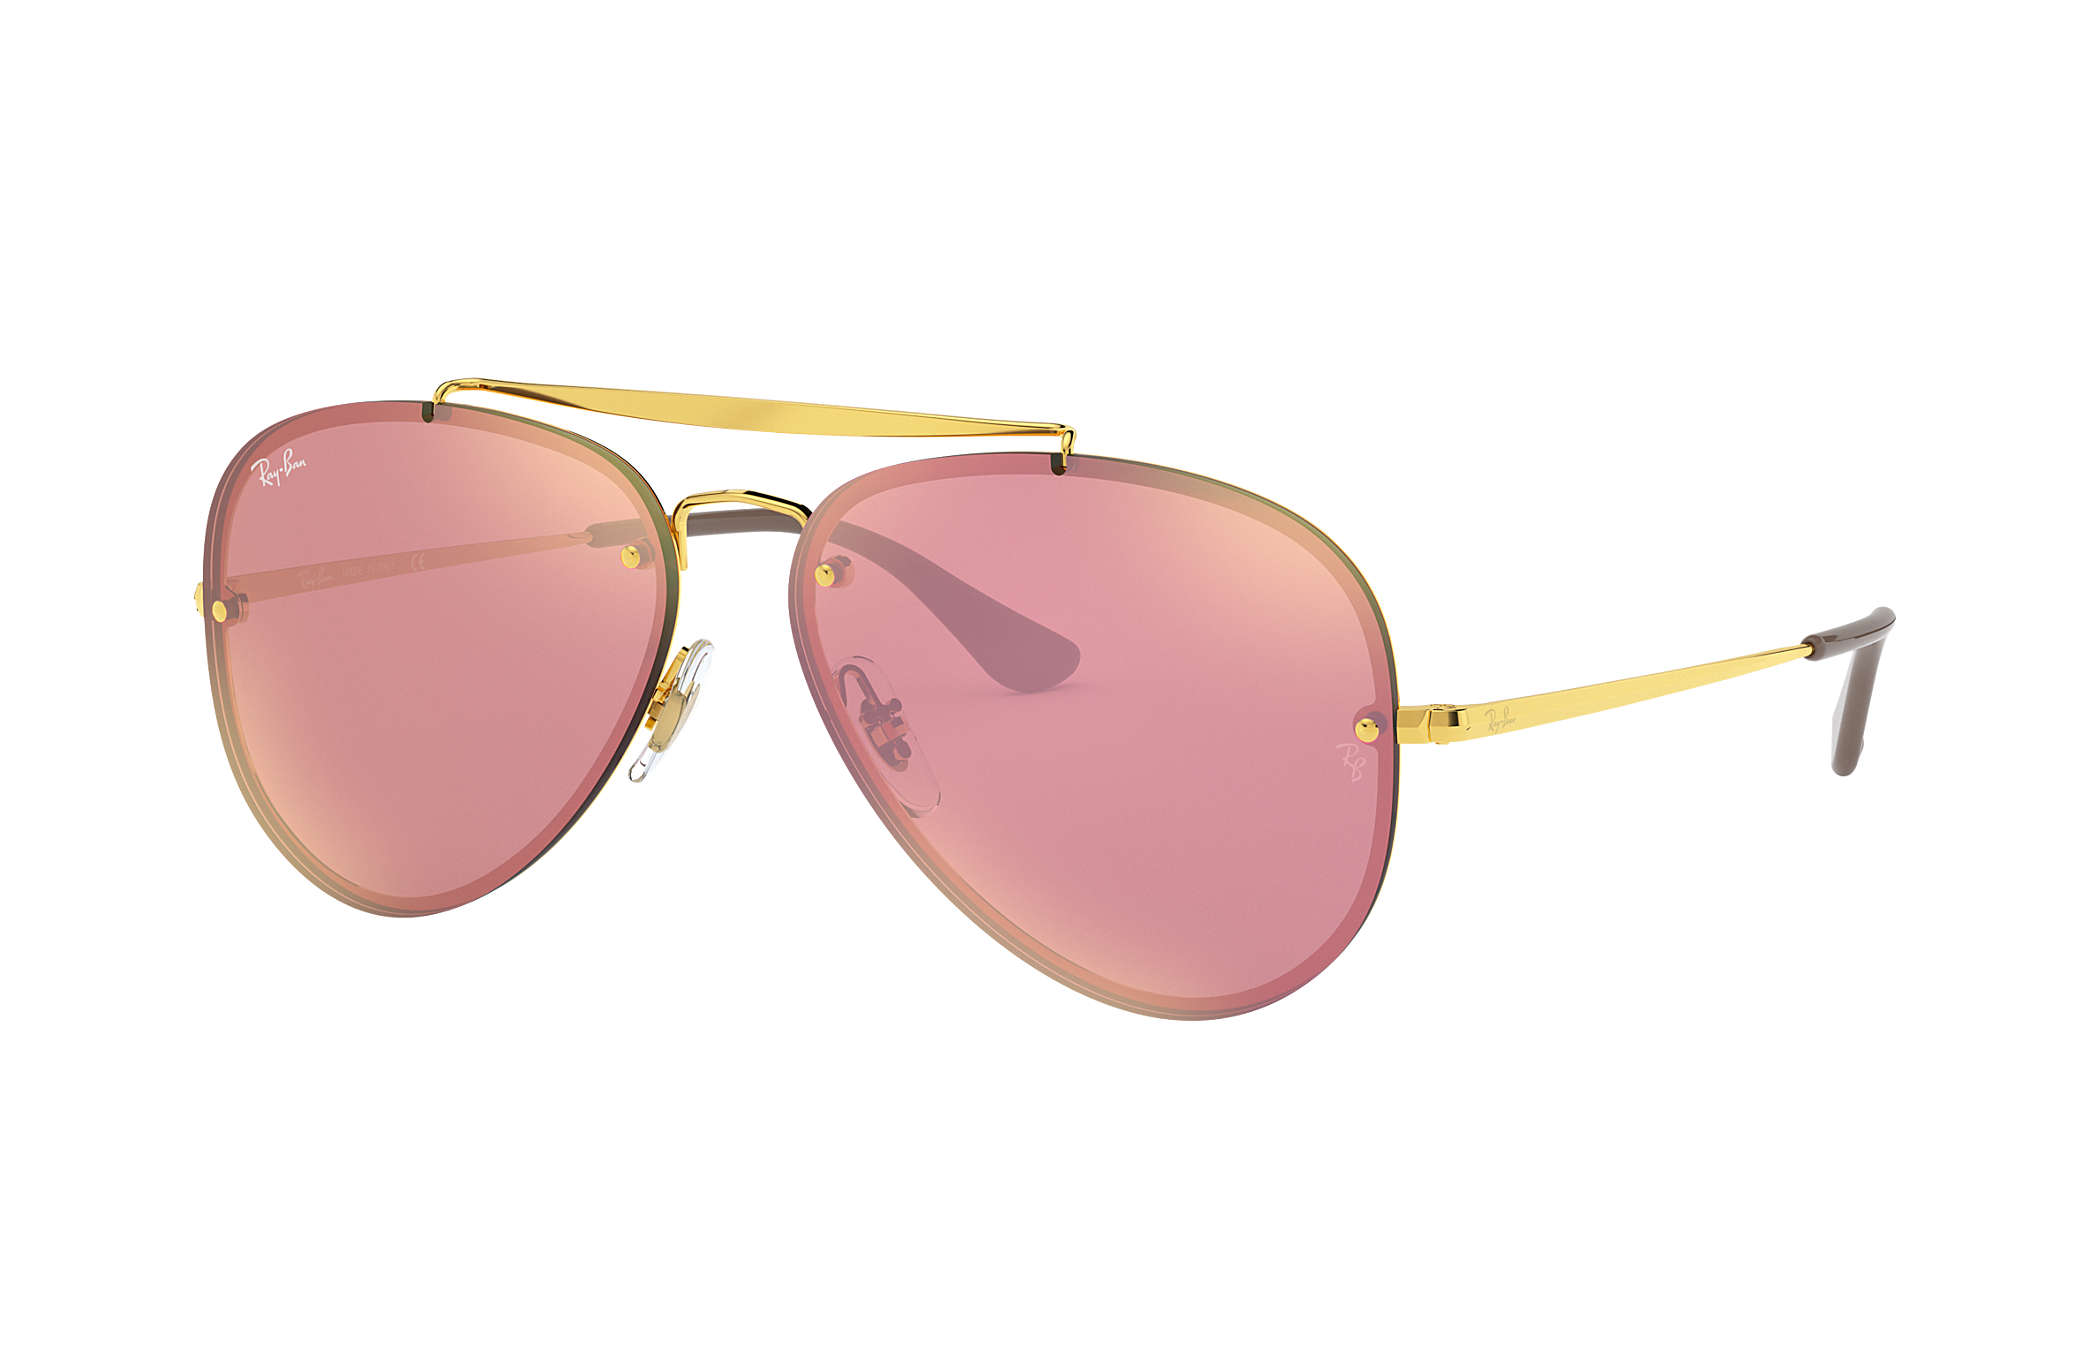 Blaze Aviator Sunglasses in Gold Pink Mirror RB3584N 9052E4 61 Ray-Ban 4BCRtA